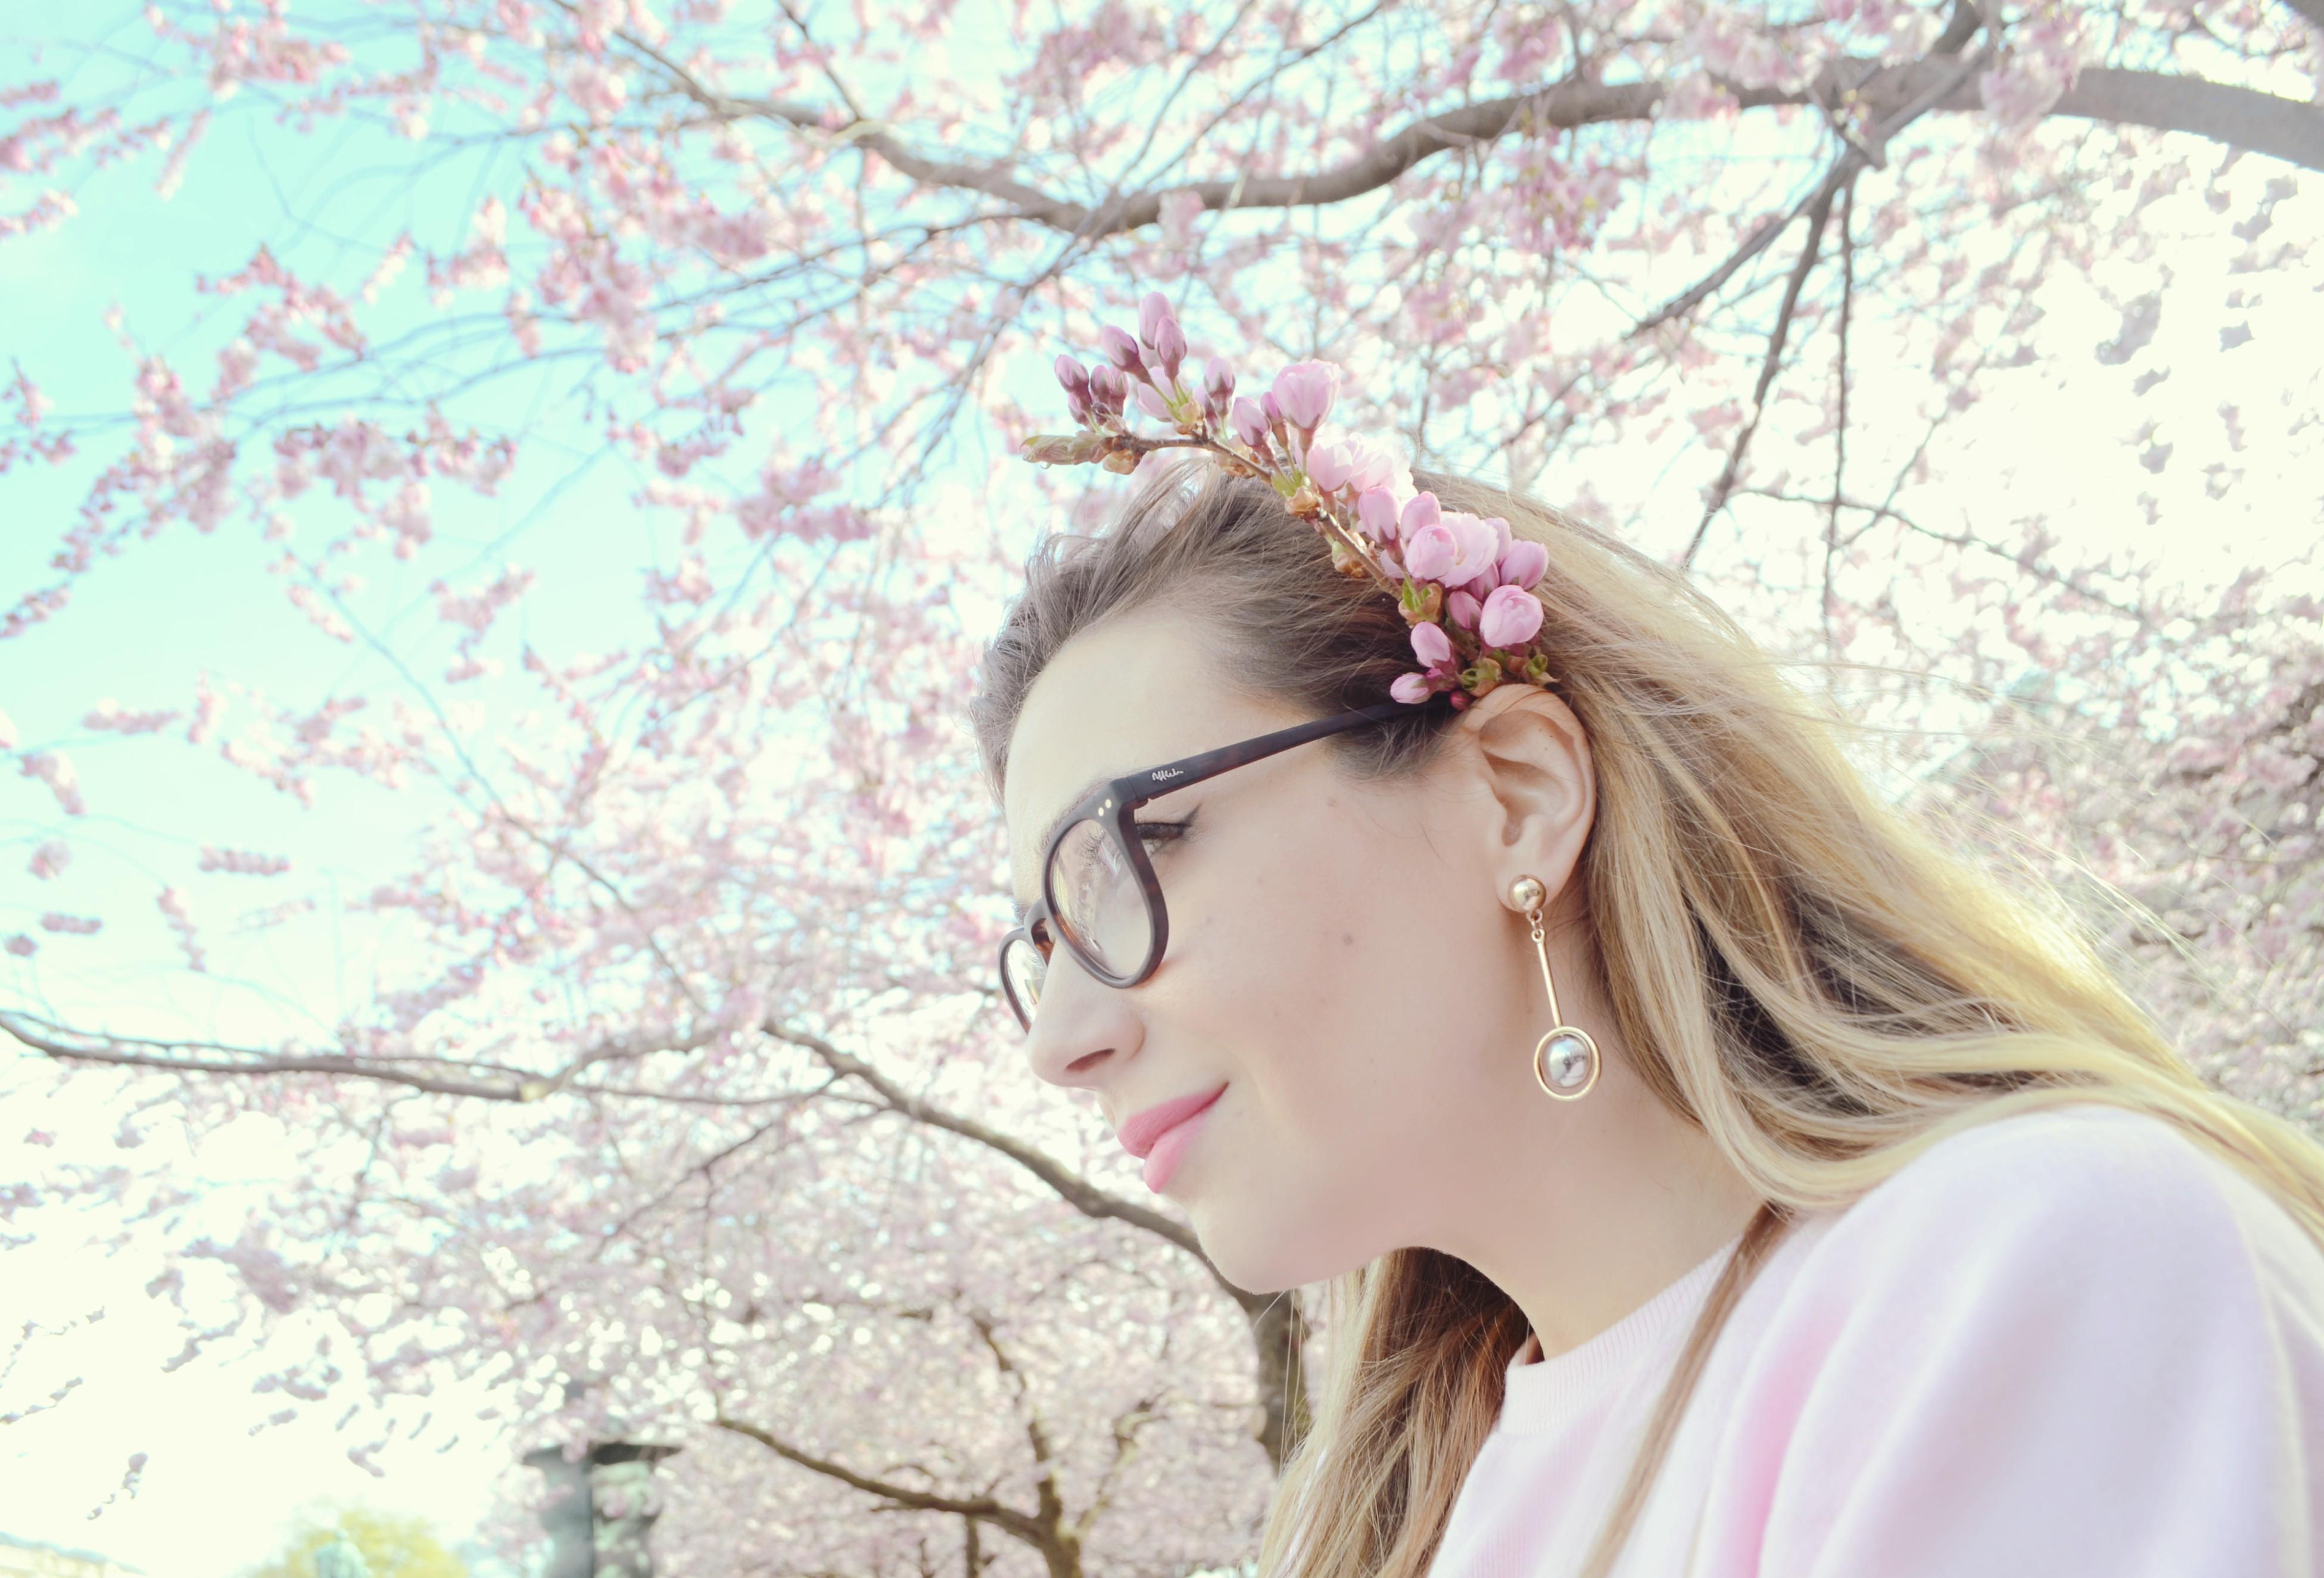 Outfit-de-primavera-blog-de-moda-ChicAdicta-zara-style-Chic-Adicta-PiensaenChic-cherry-blossom-stockholm-Piensa-en-Chic